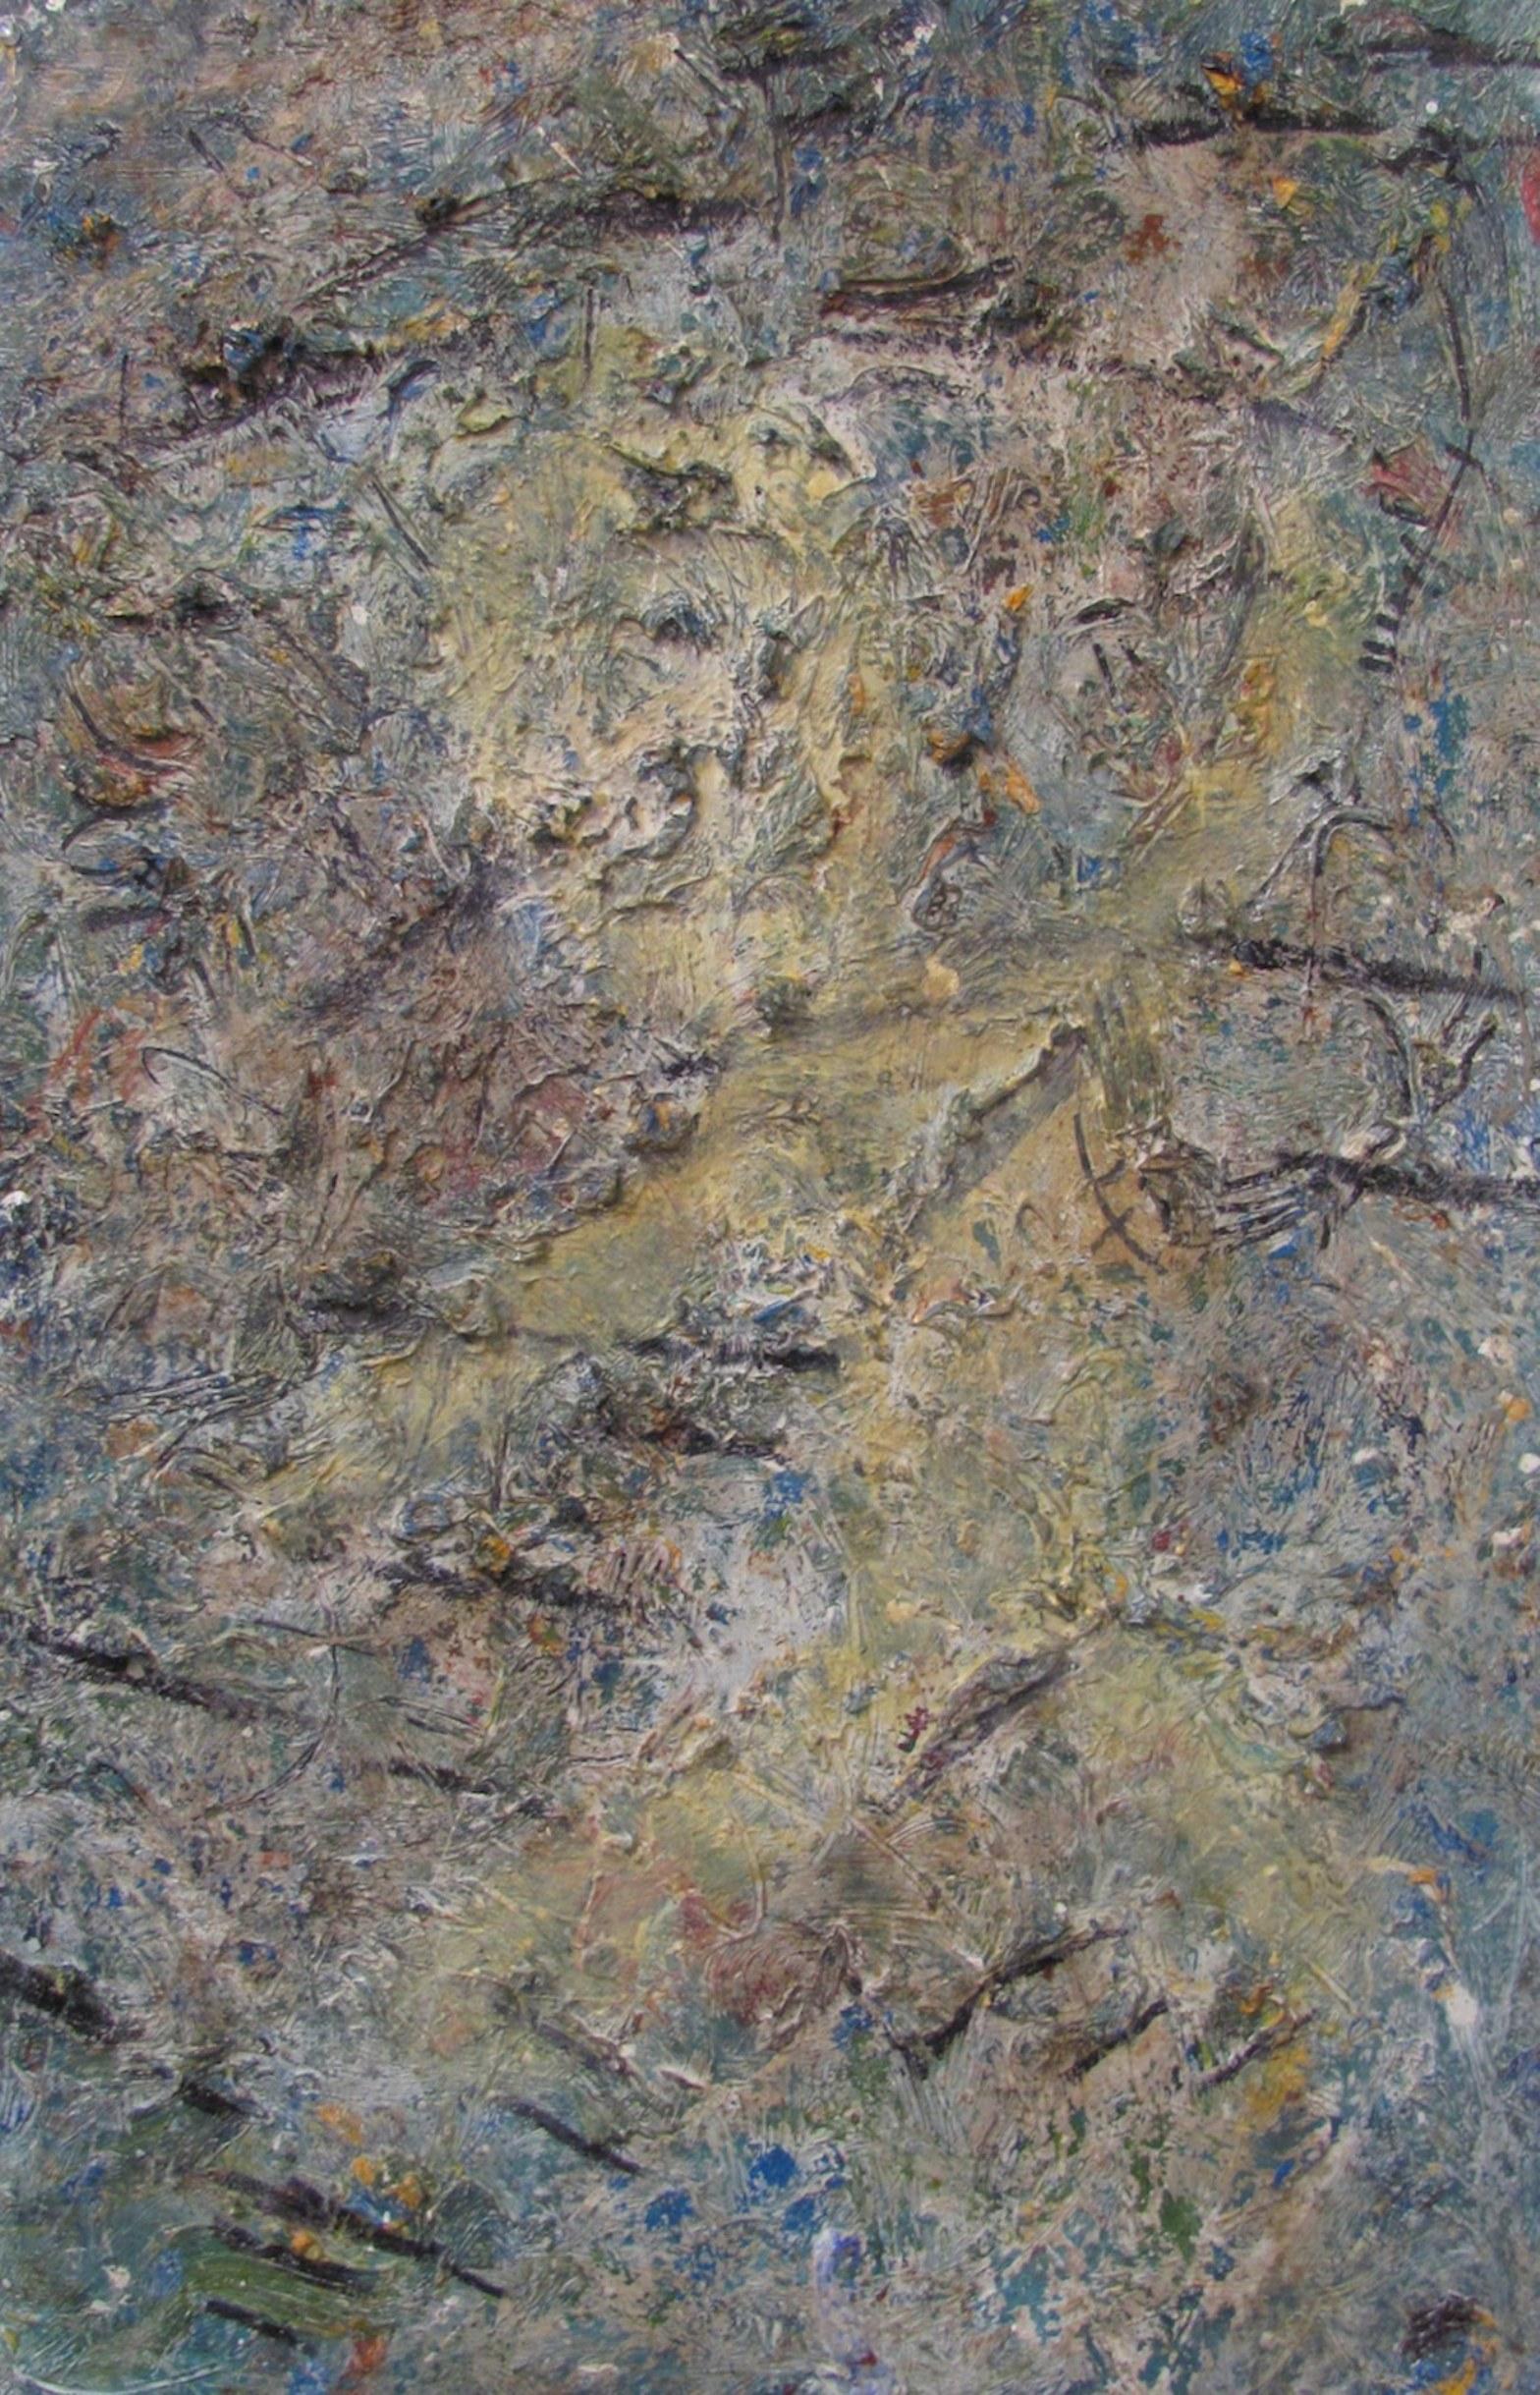 Sebanc_Fallen Oil on canvas 25 X 39 2012.jpg